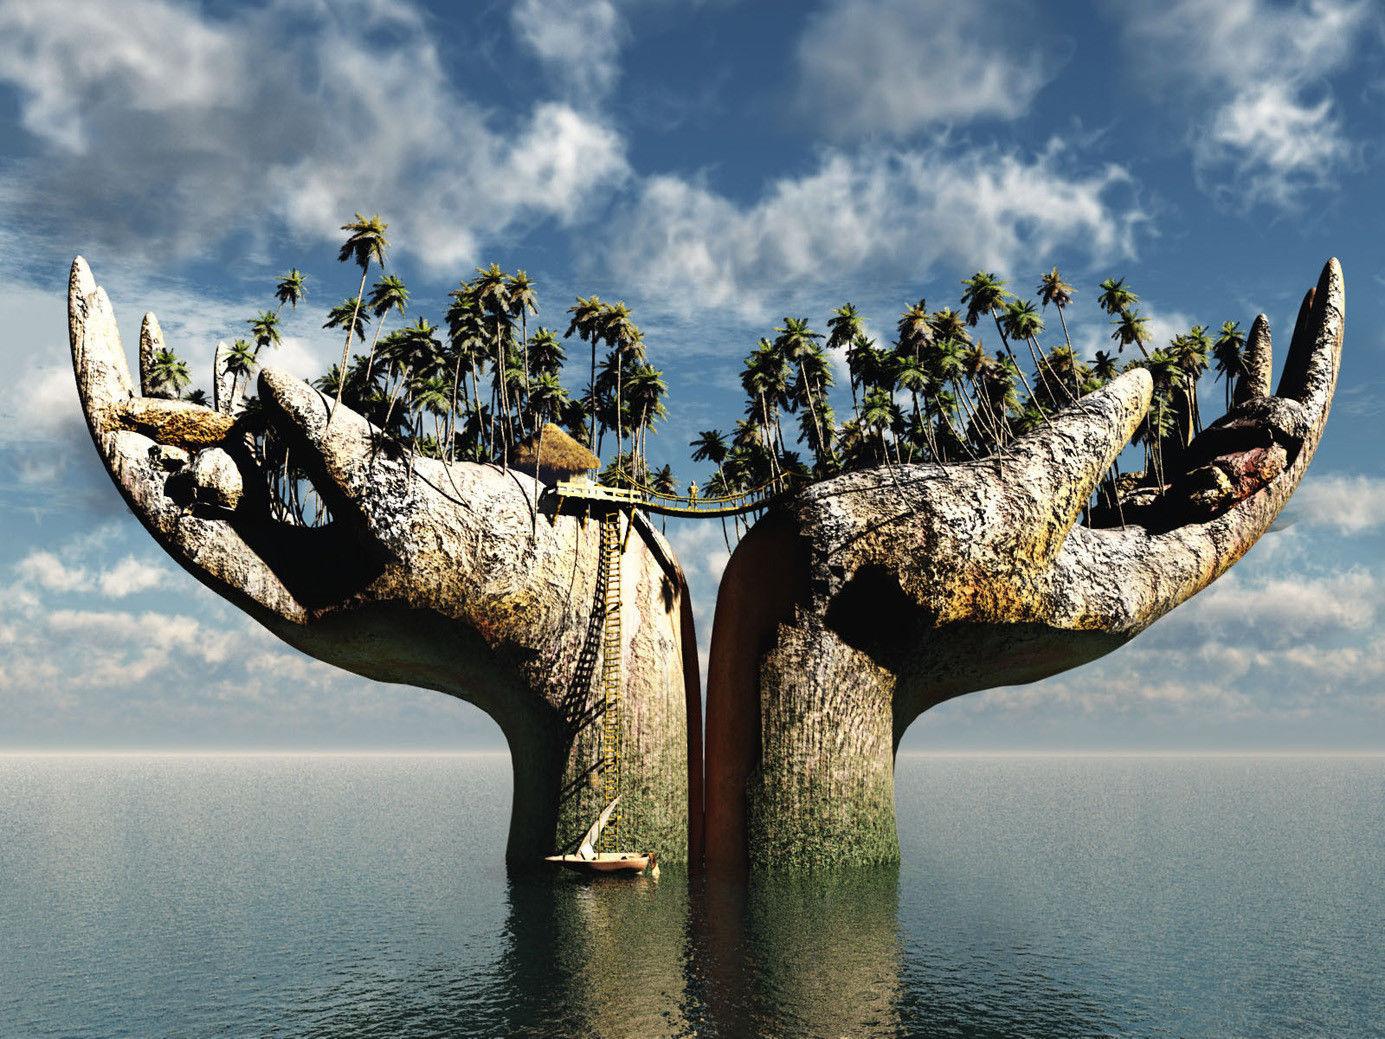 157274-Ocean-Island-Landscape-Nature-Wall-Print-Poster-AU